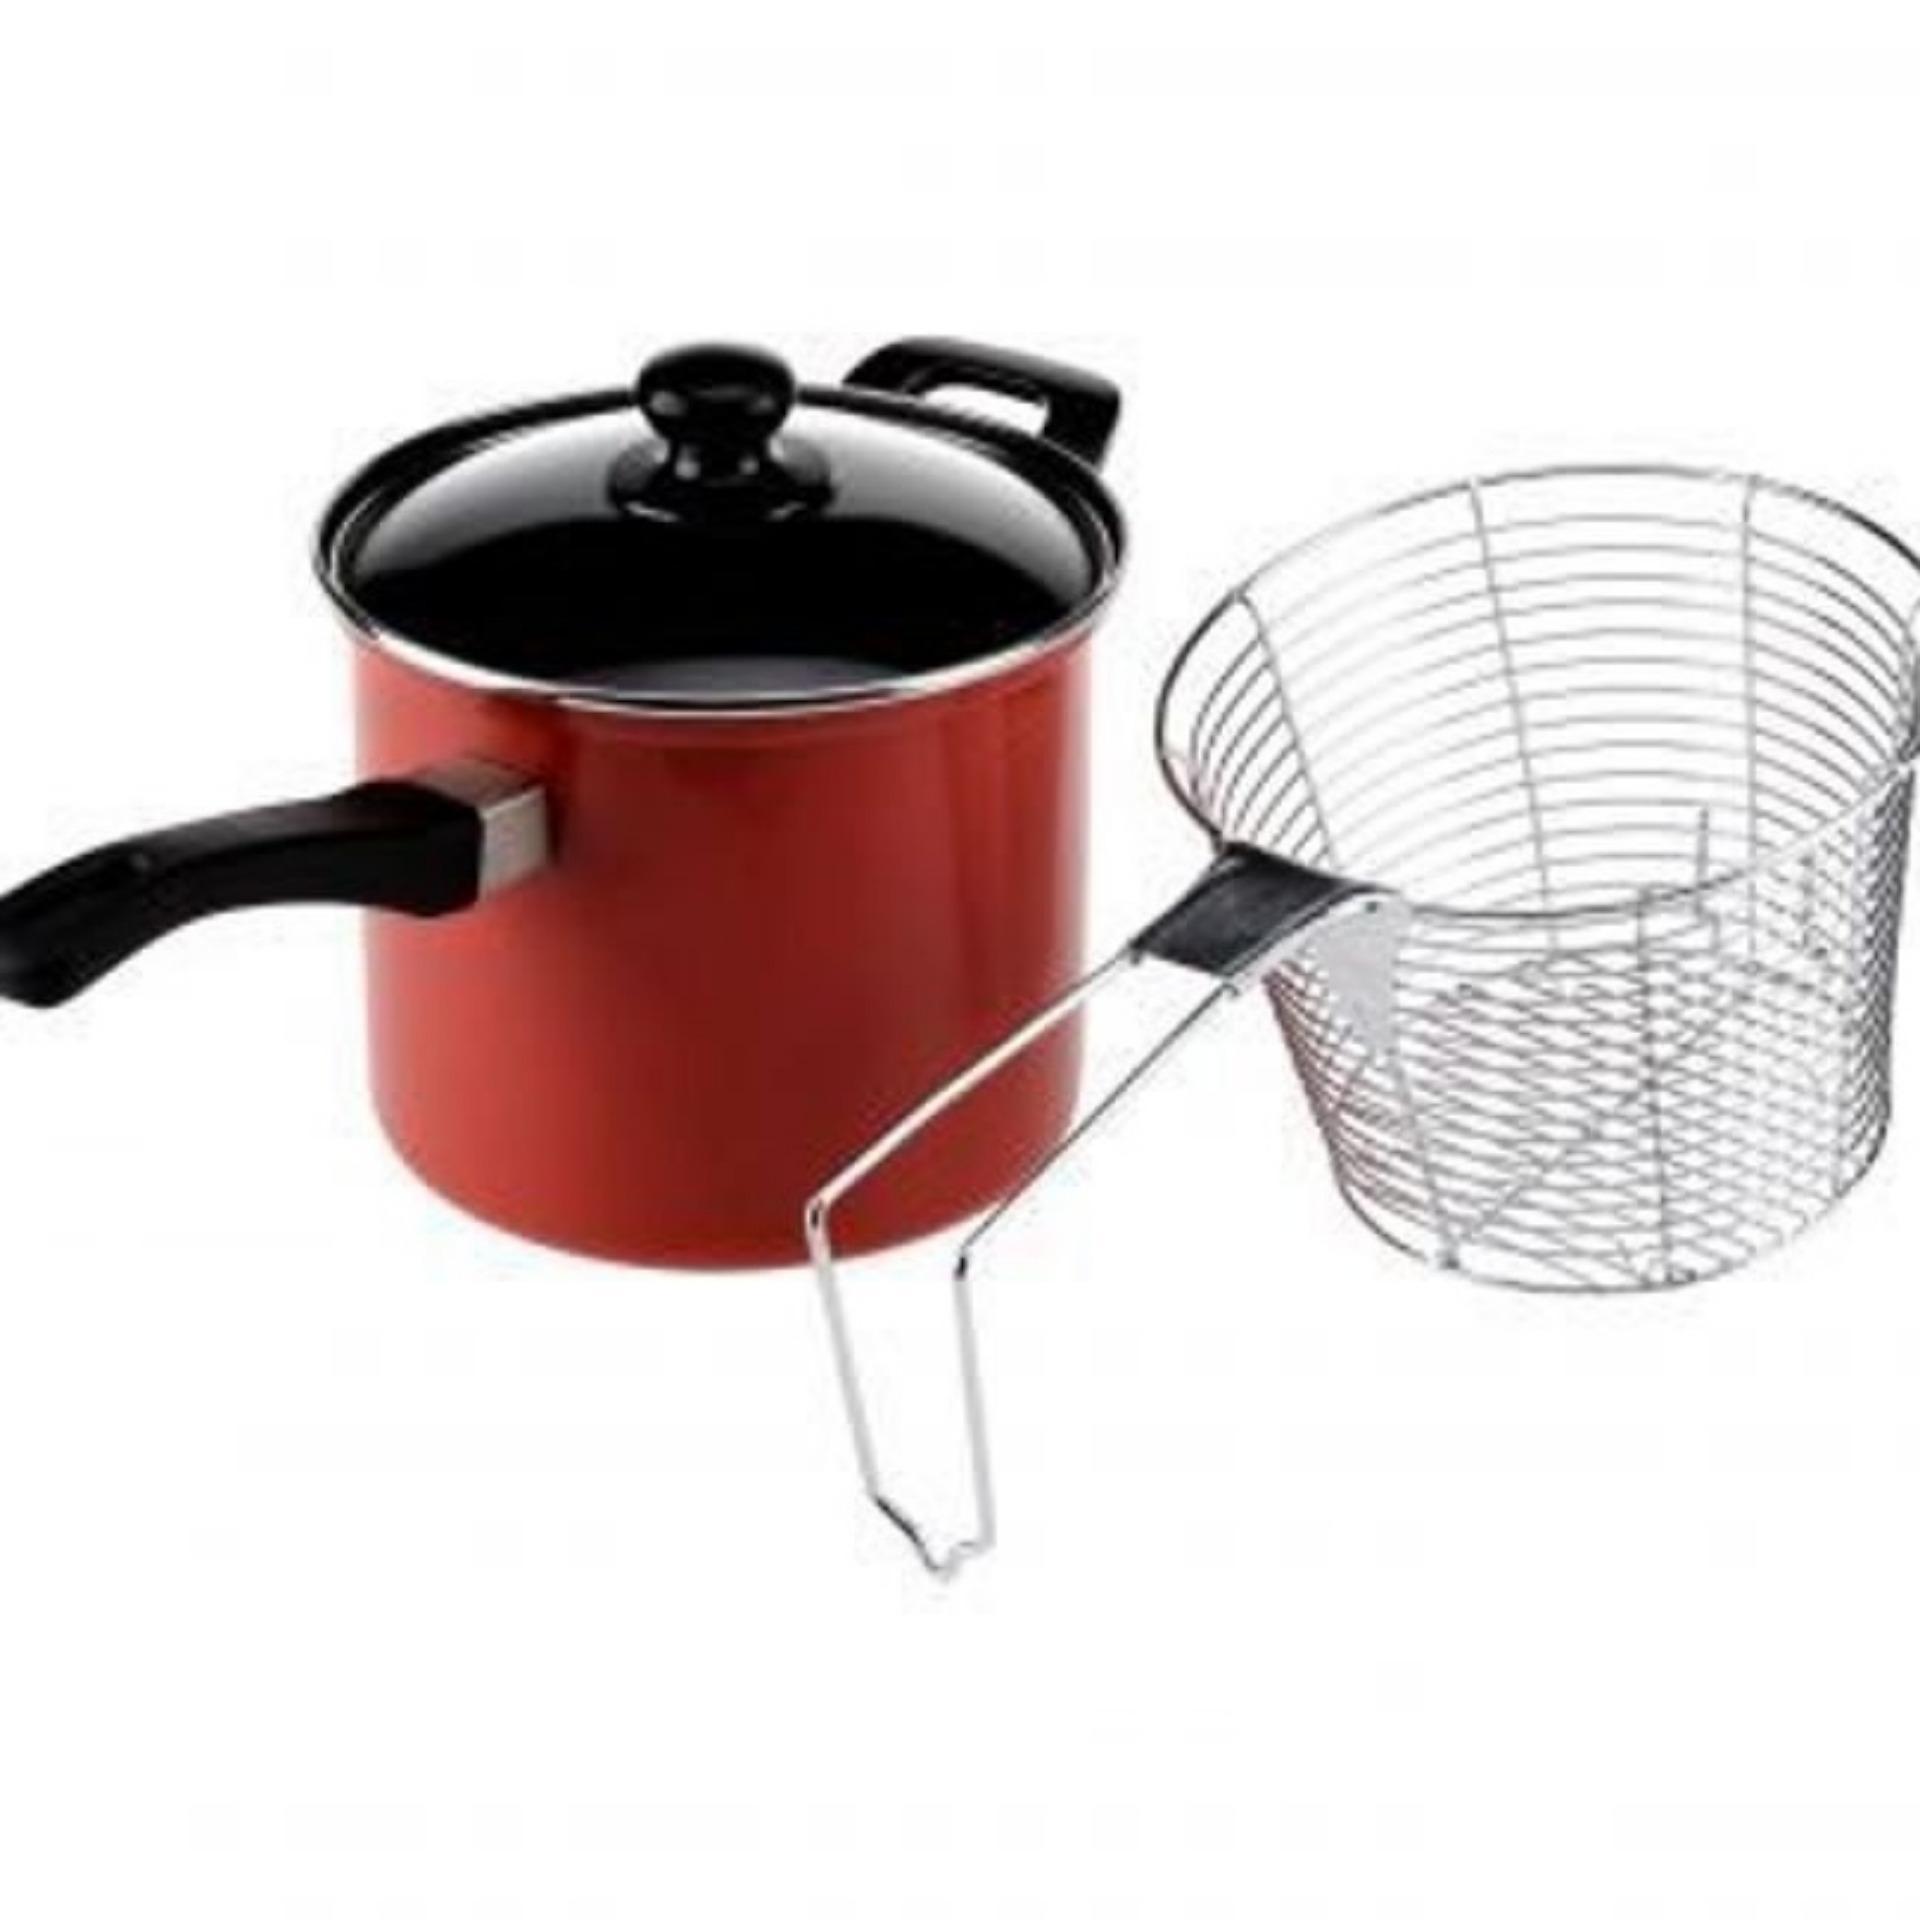 Magic Com Kirin Krc 087 3in1 Non Stick Il Silver Daftar Harga Rice Cooker 20 Liter